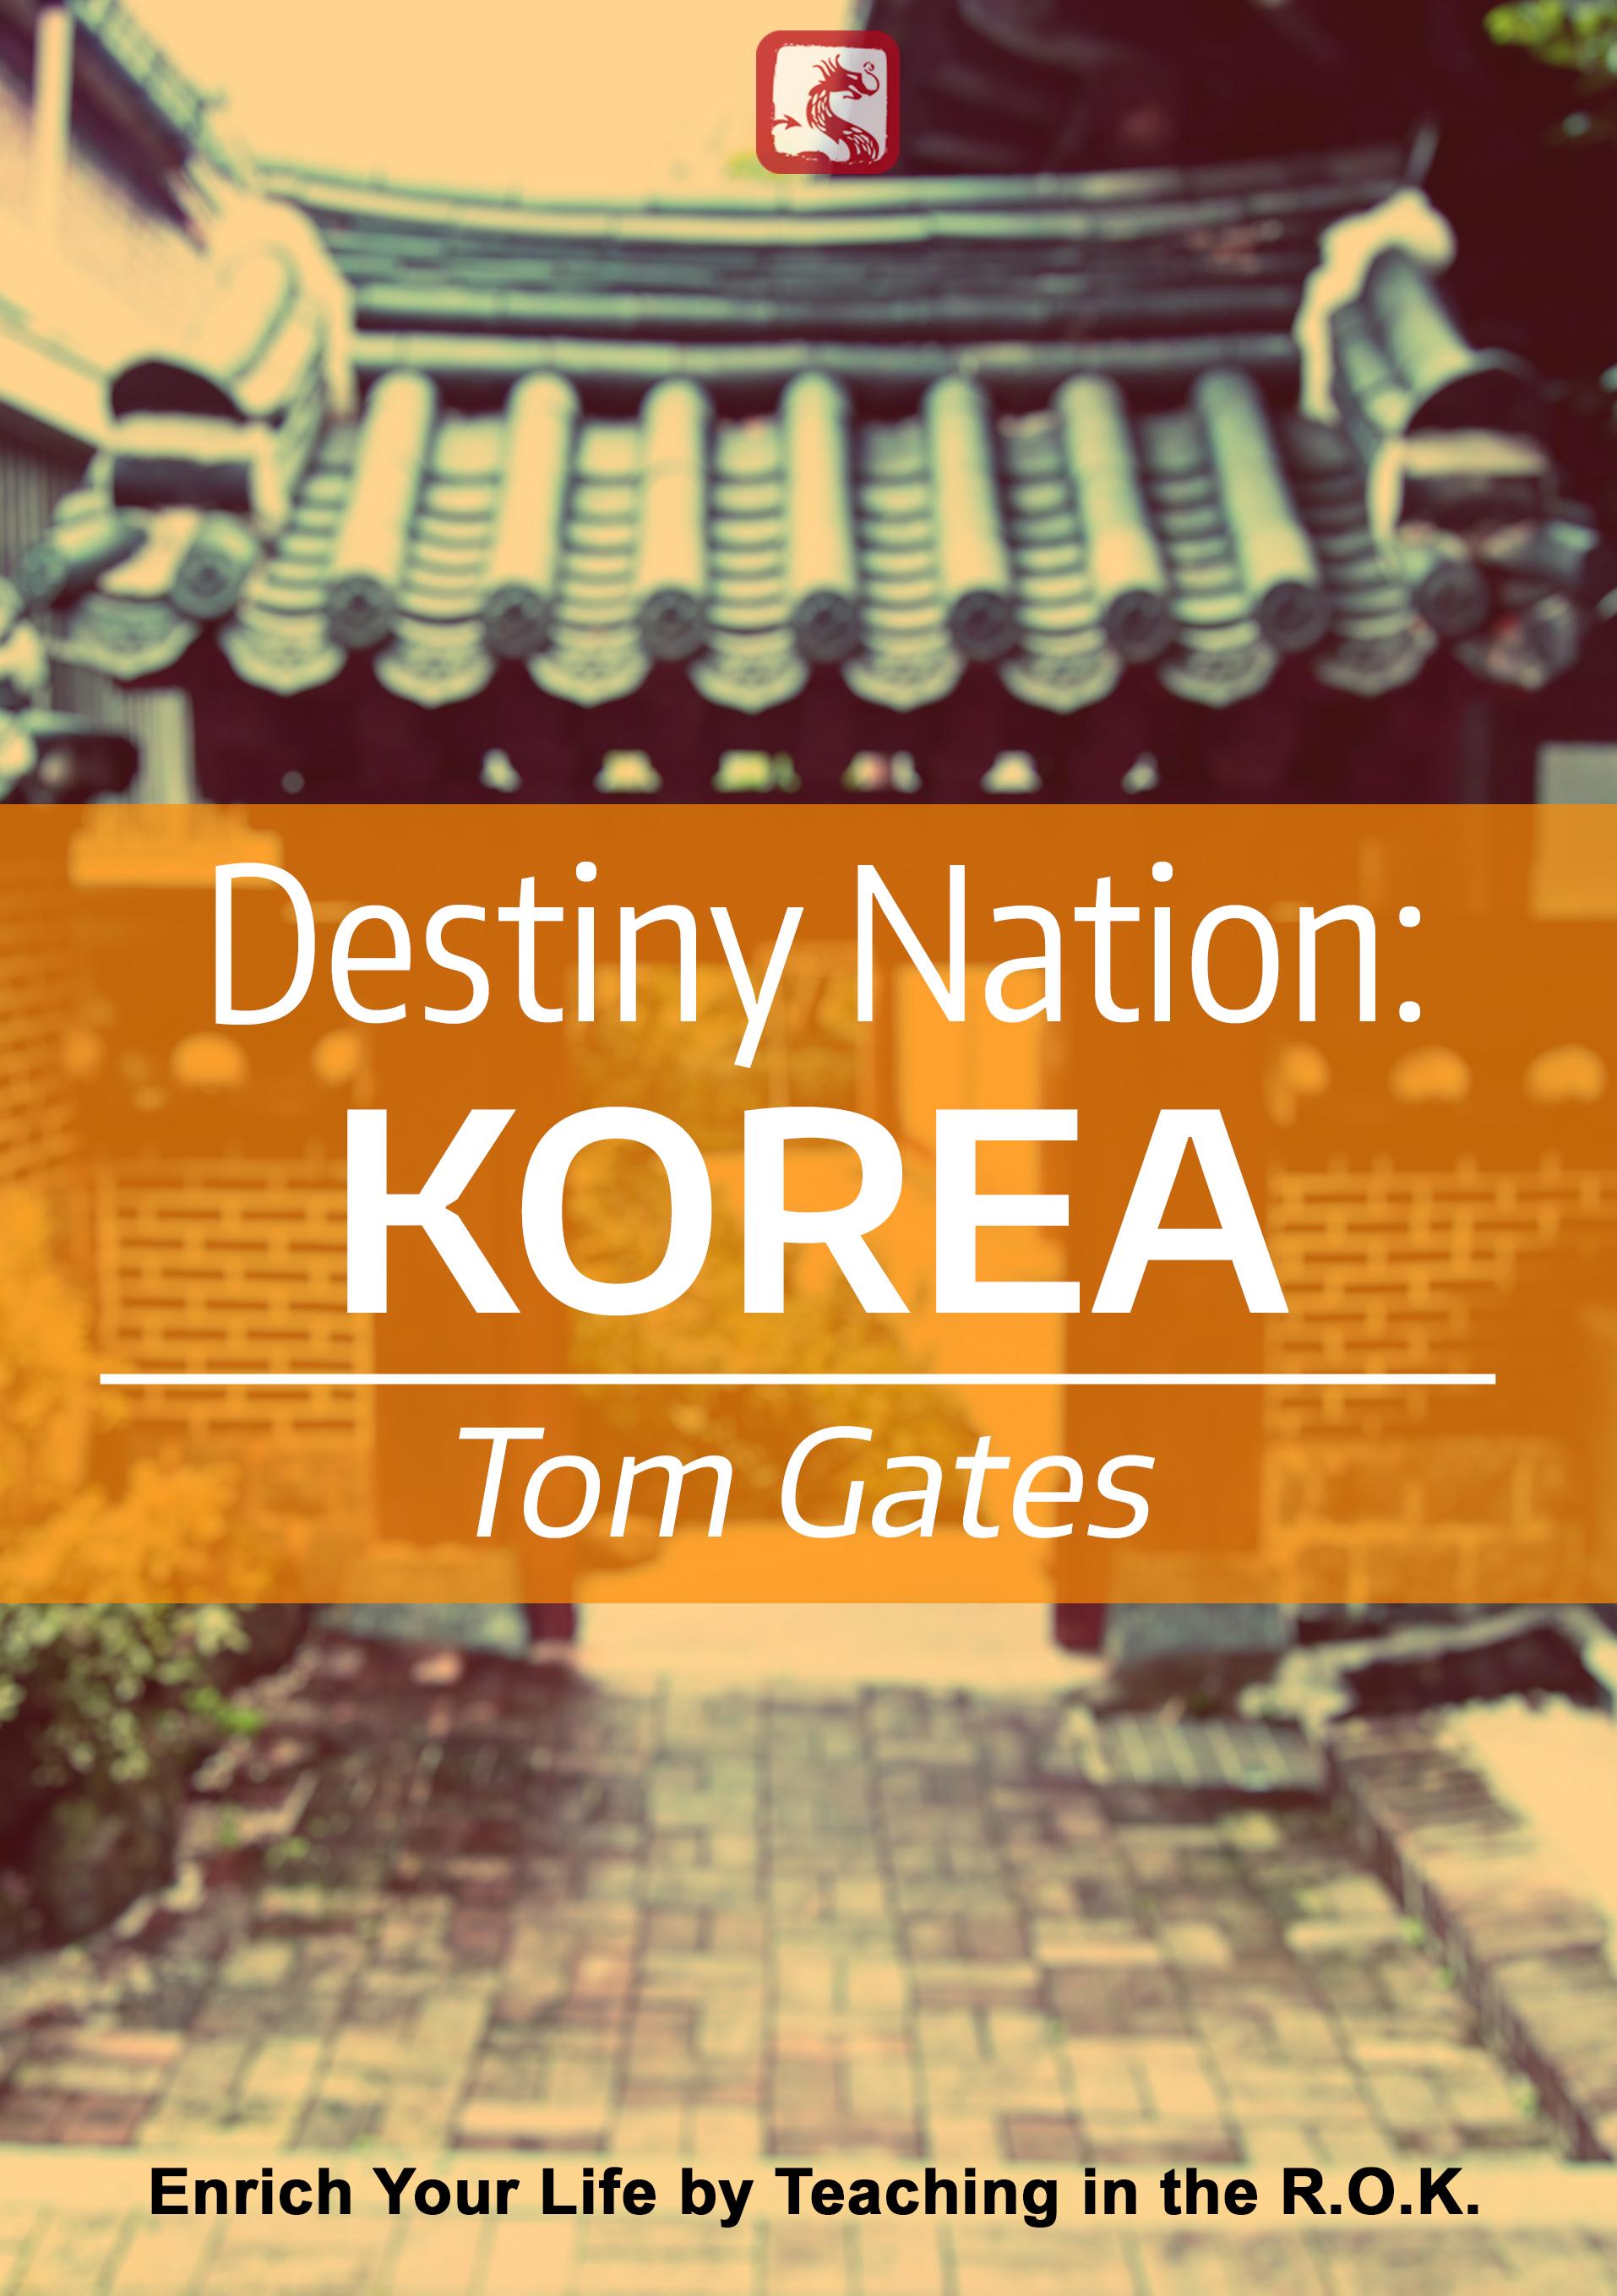 "<span class=""widget-headline"">Teach in Korea eBook</span>"